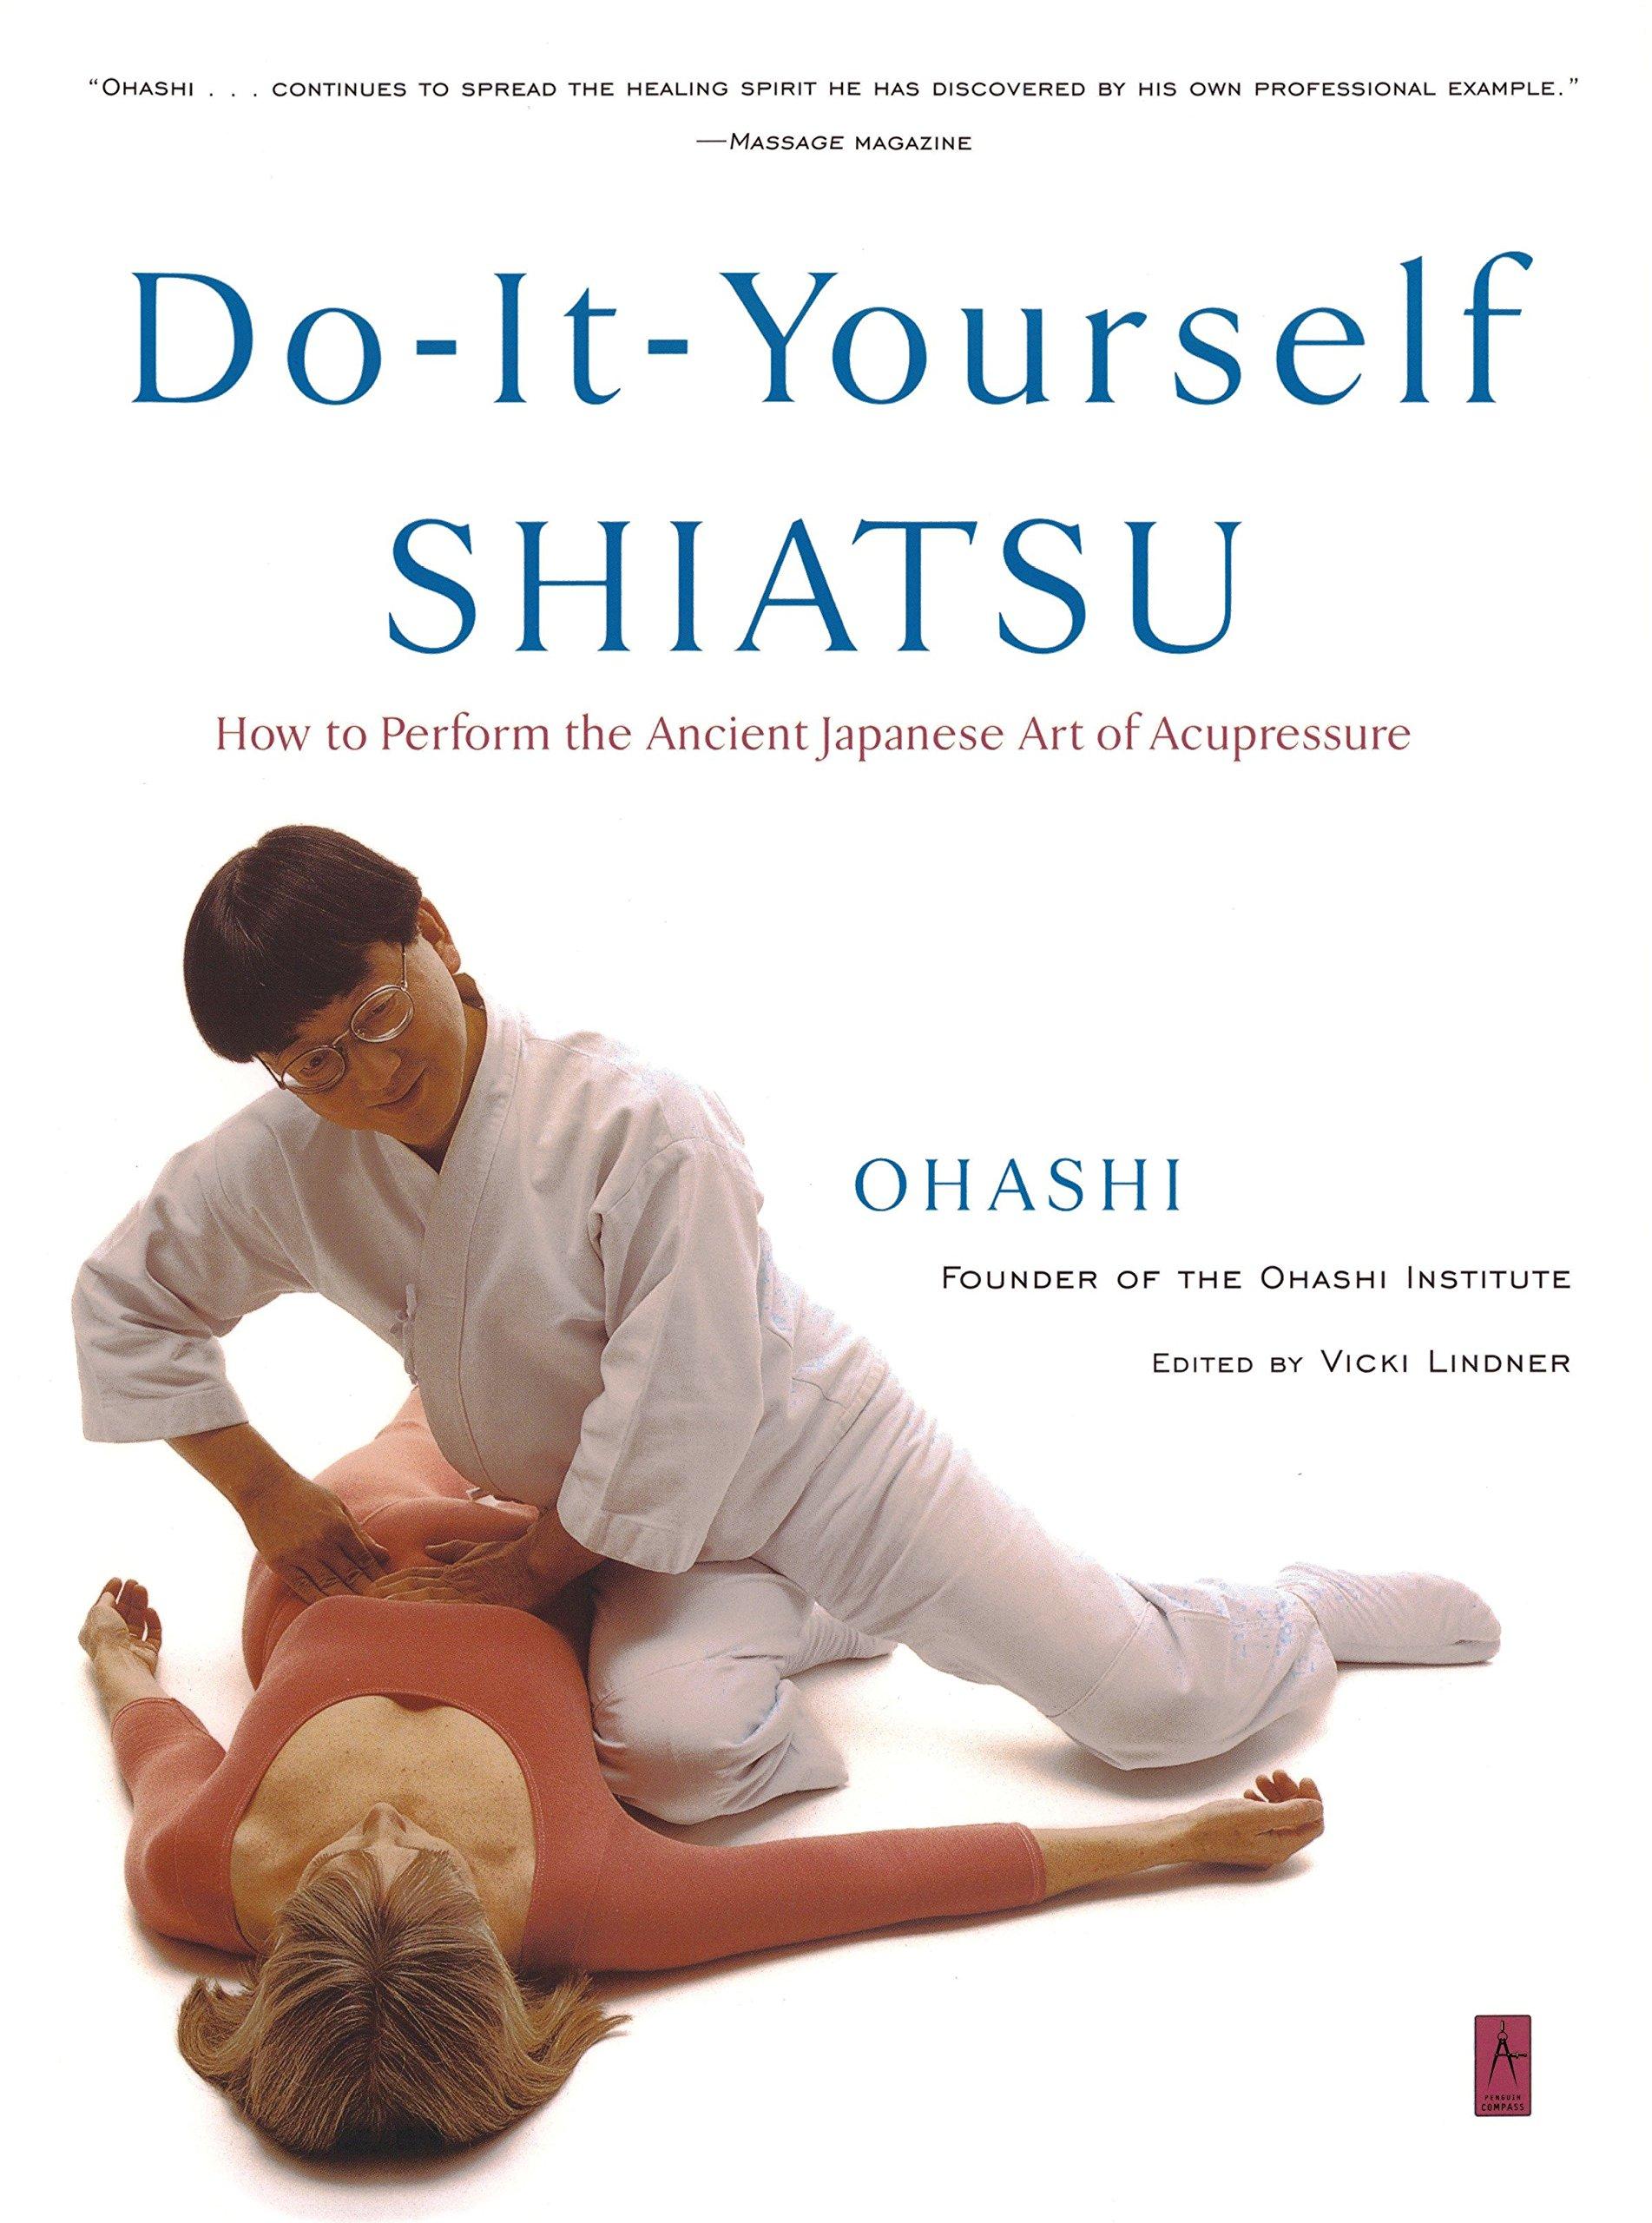 Do-It-Yourself Shiatsu: How to Perform the Ancient Japanese Art of  Acupressure (Compass): Wataru Ohashi: 9780140196320: Amazon.com: Books